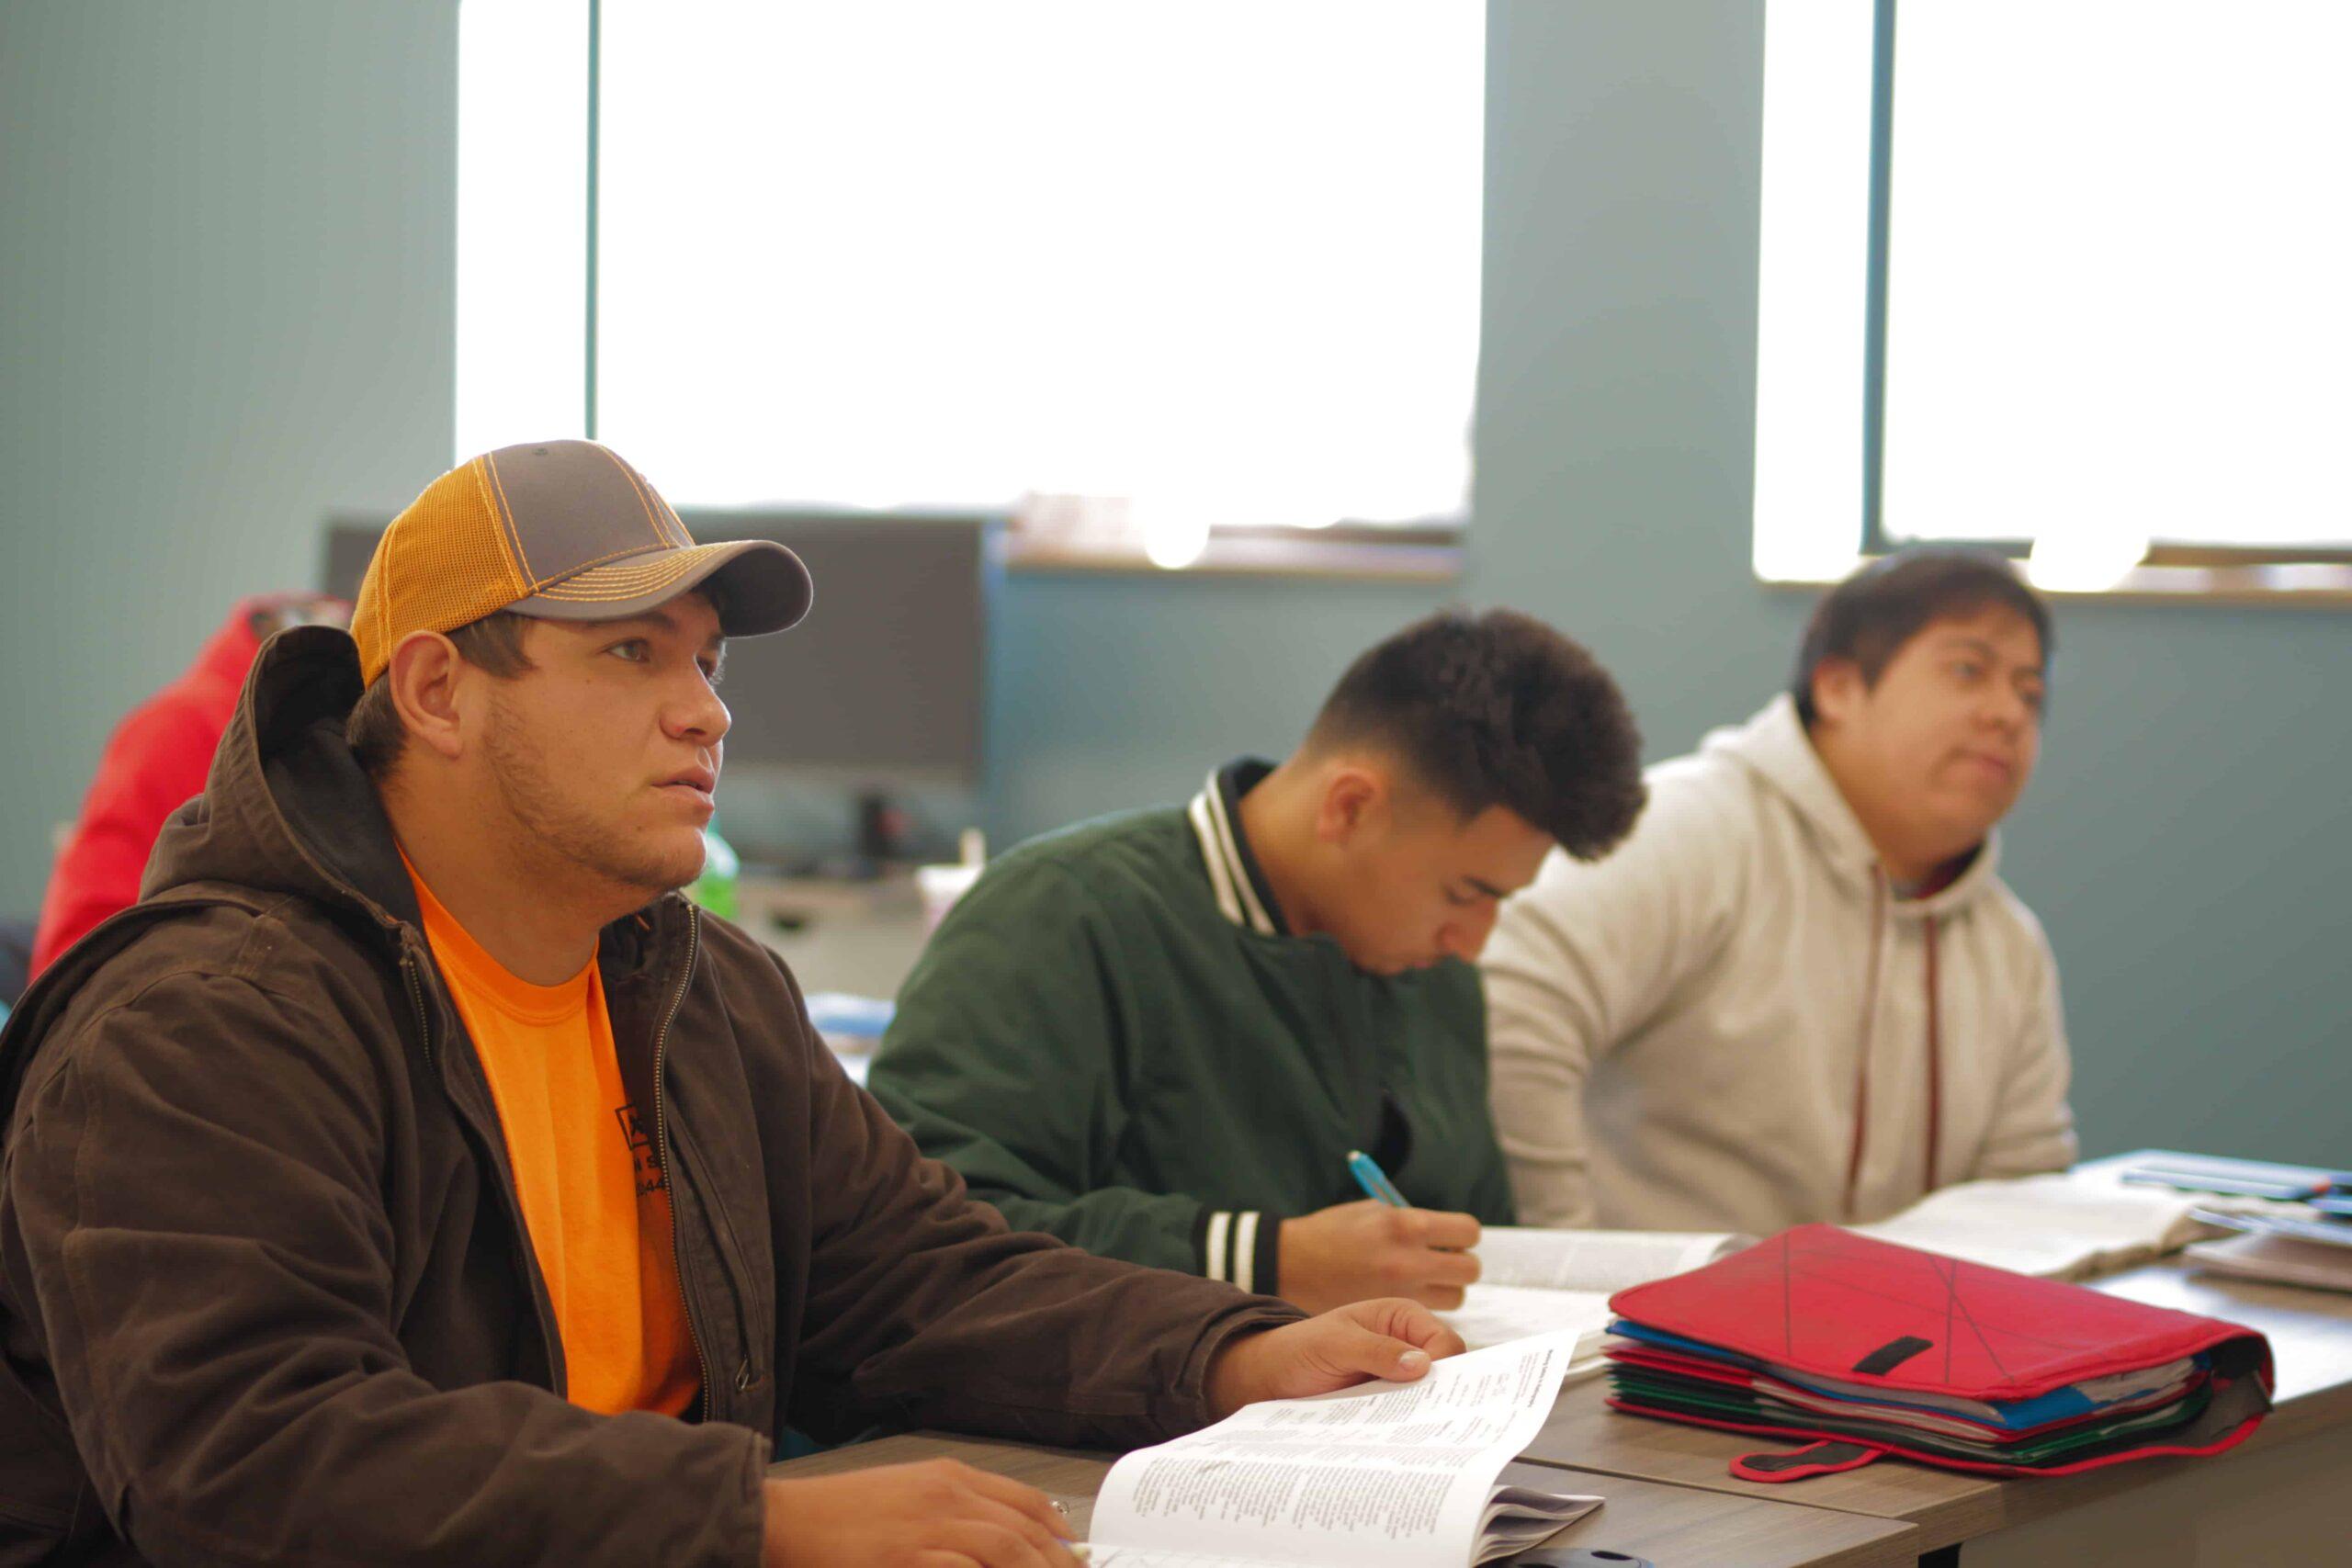 online associate degree programs